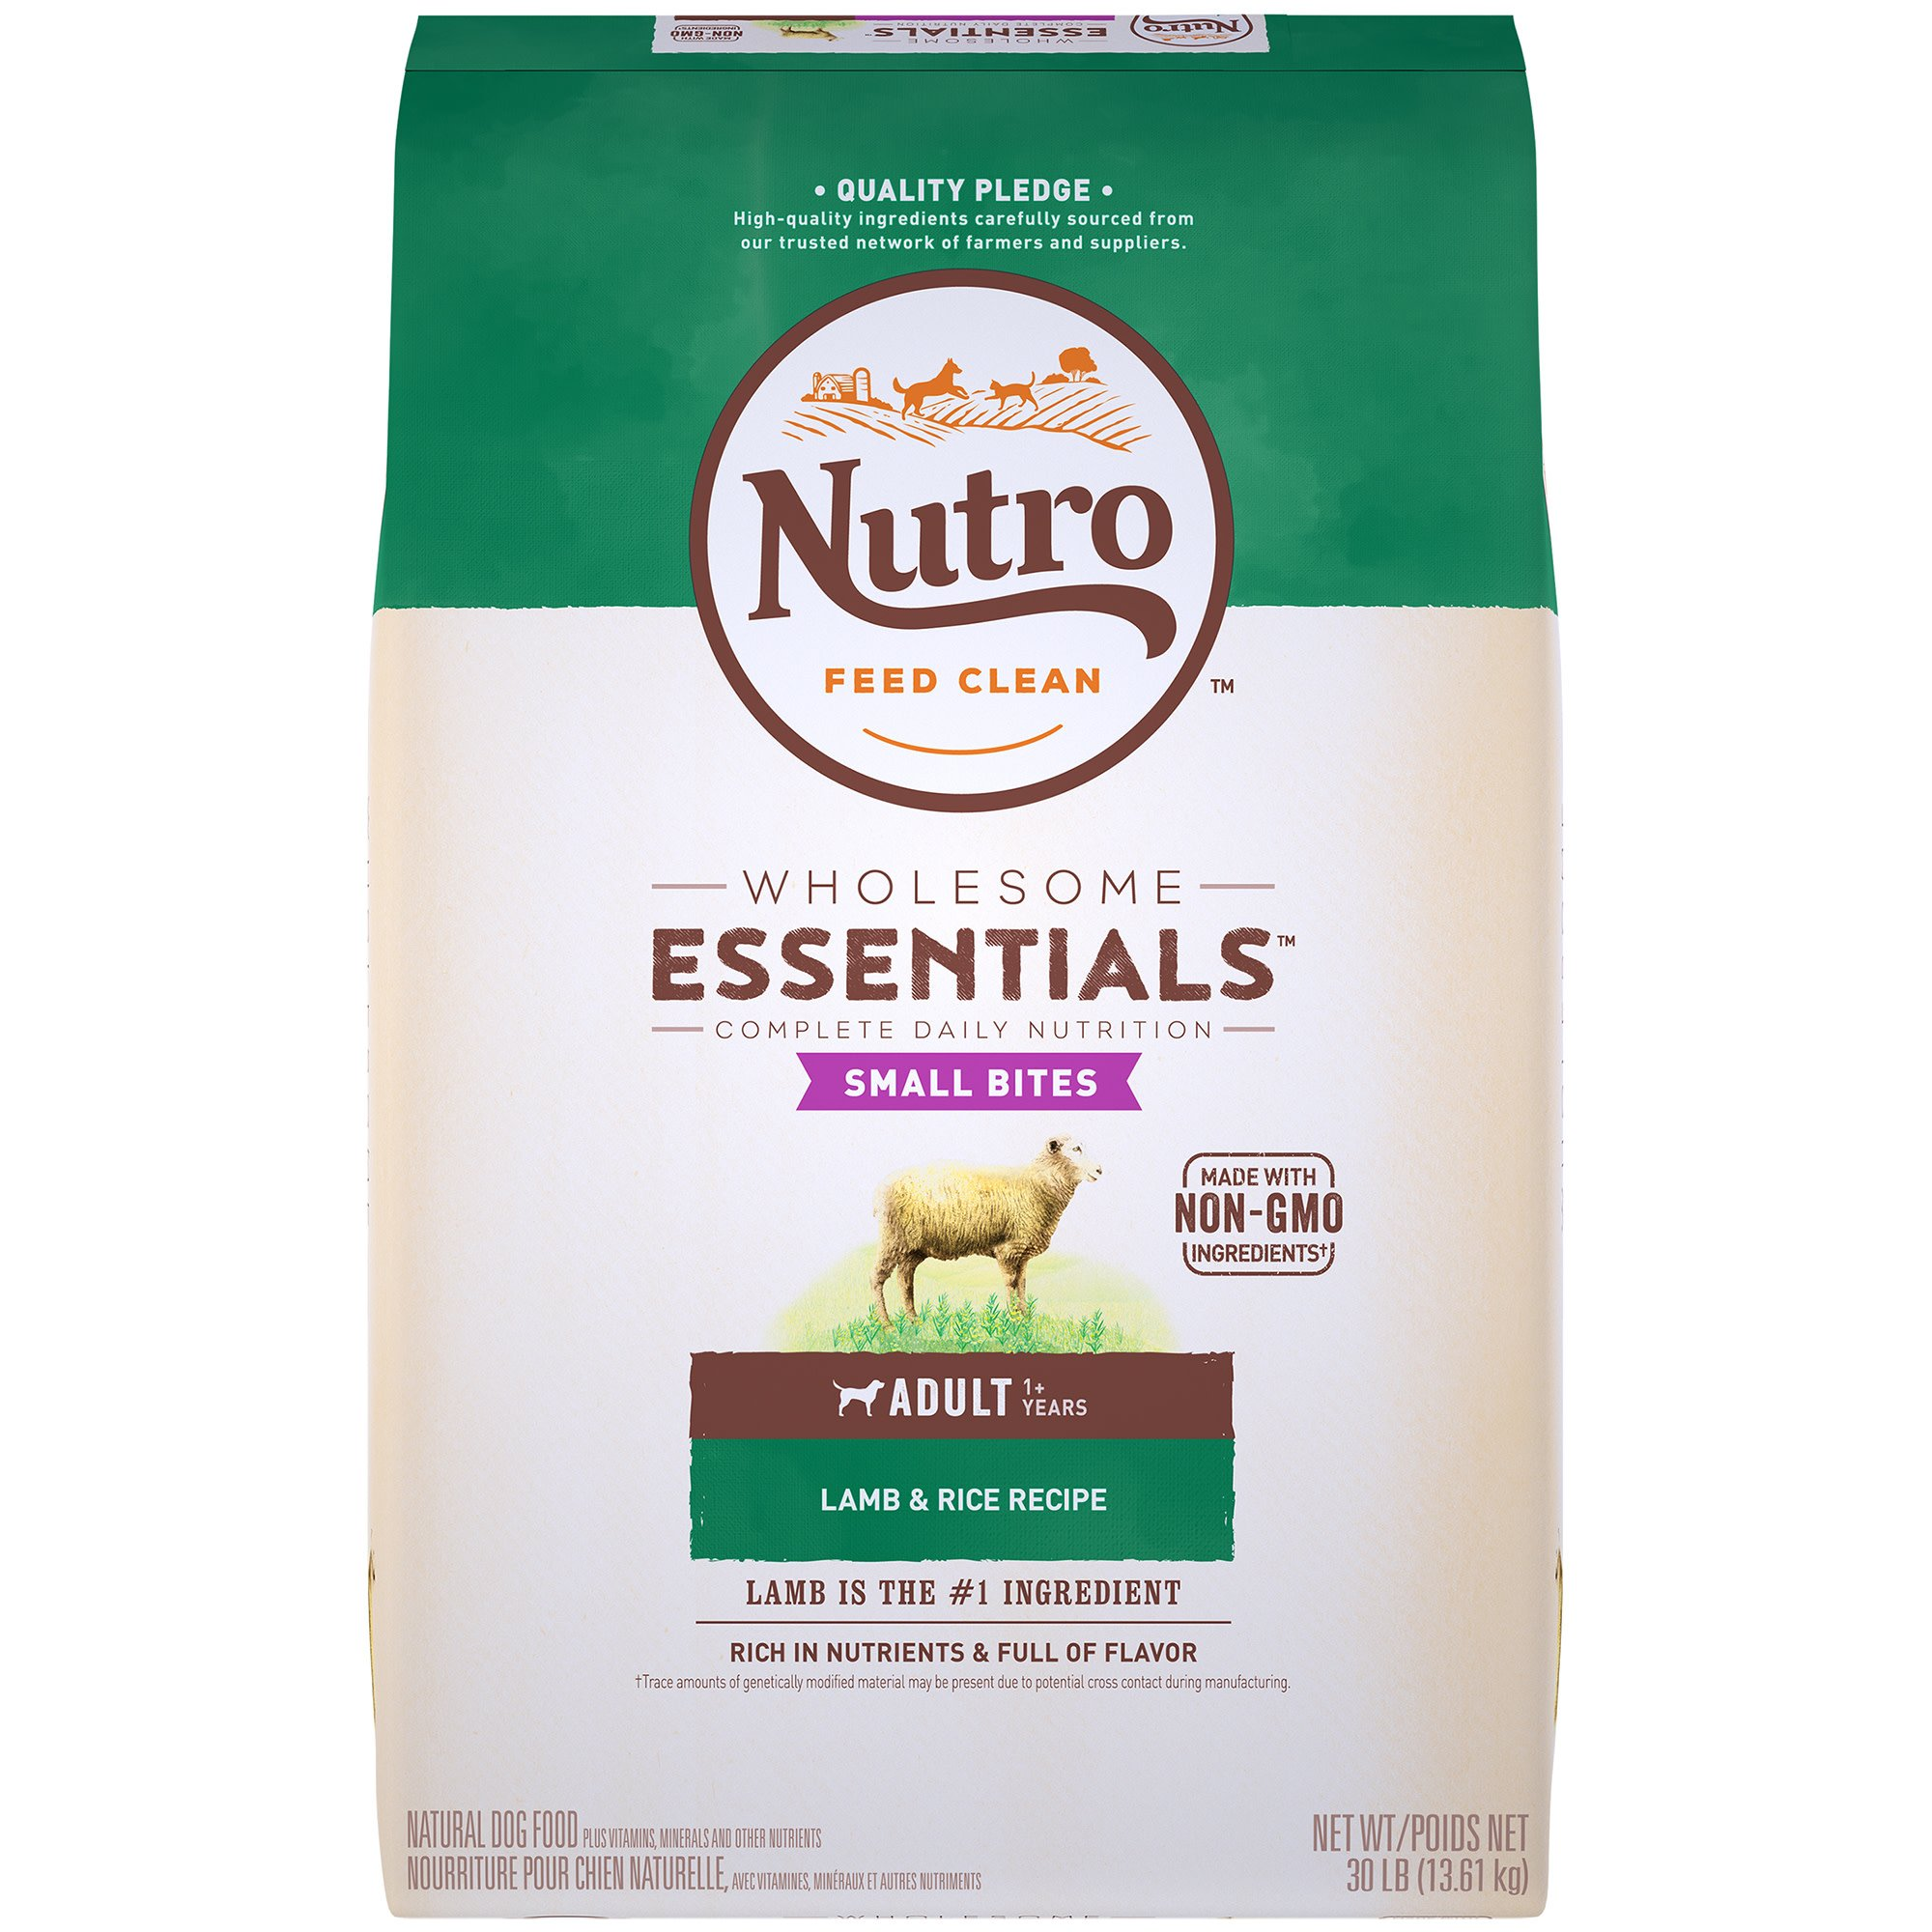 Nutro Dog Food Price Comparison